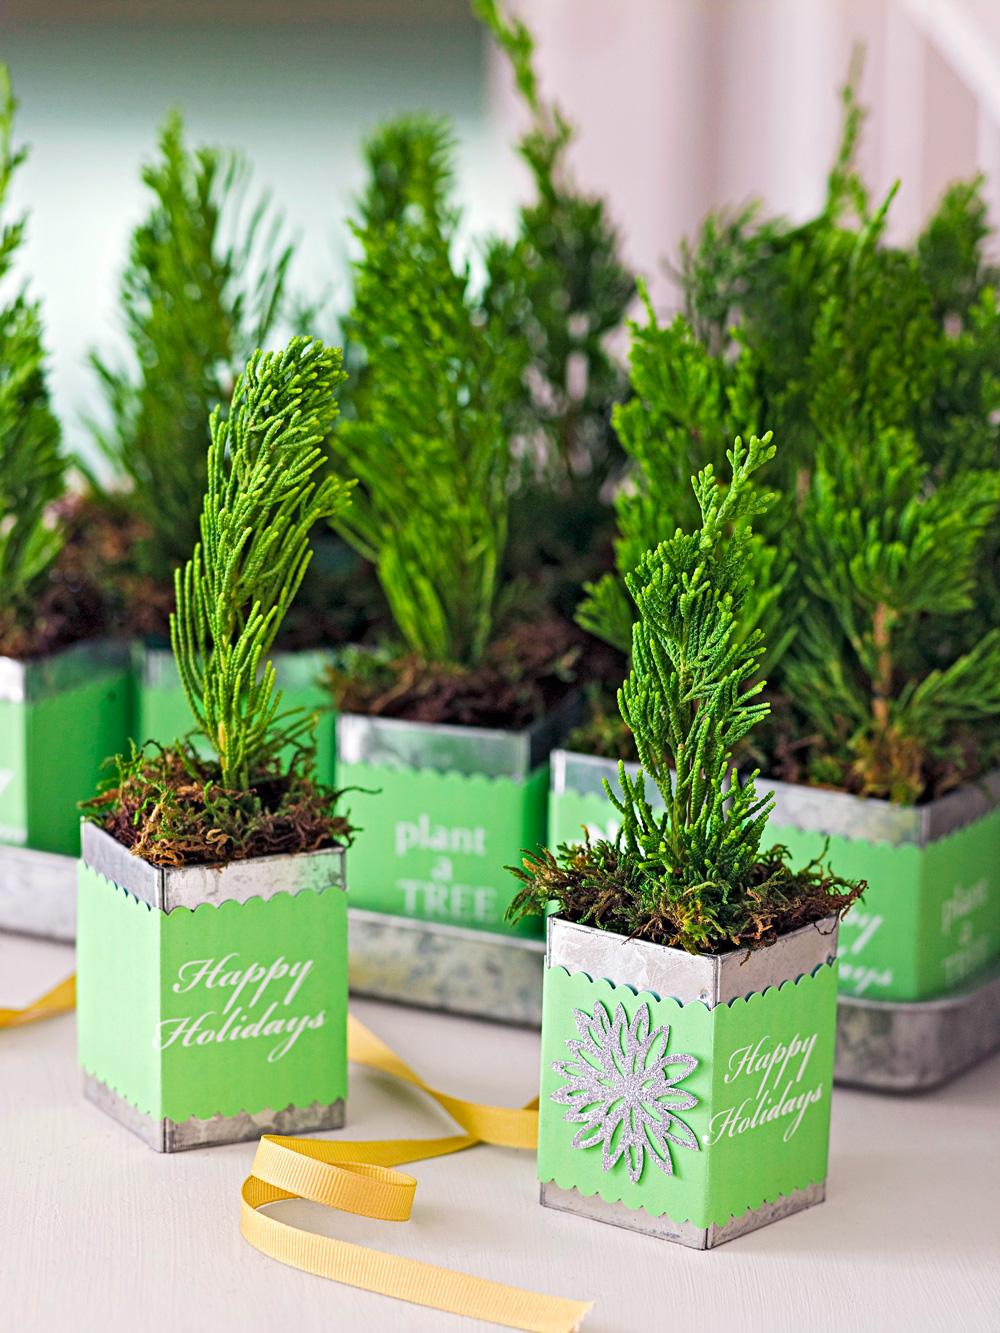 Gift trees